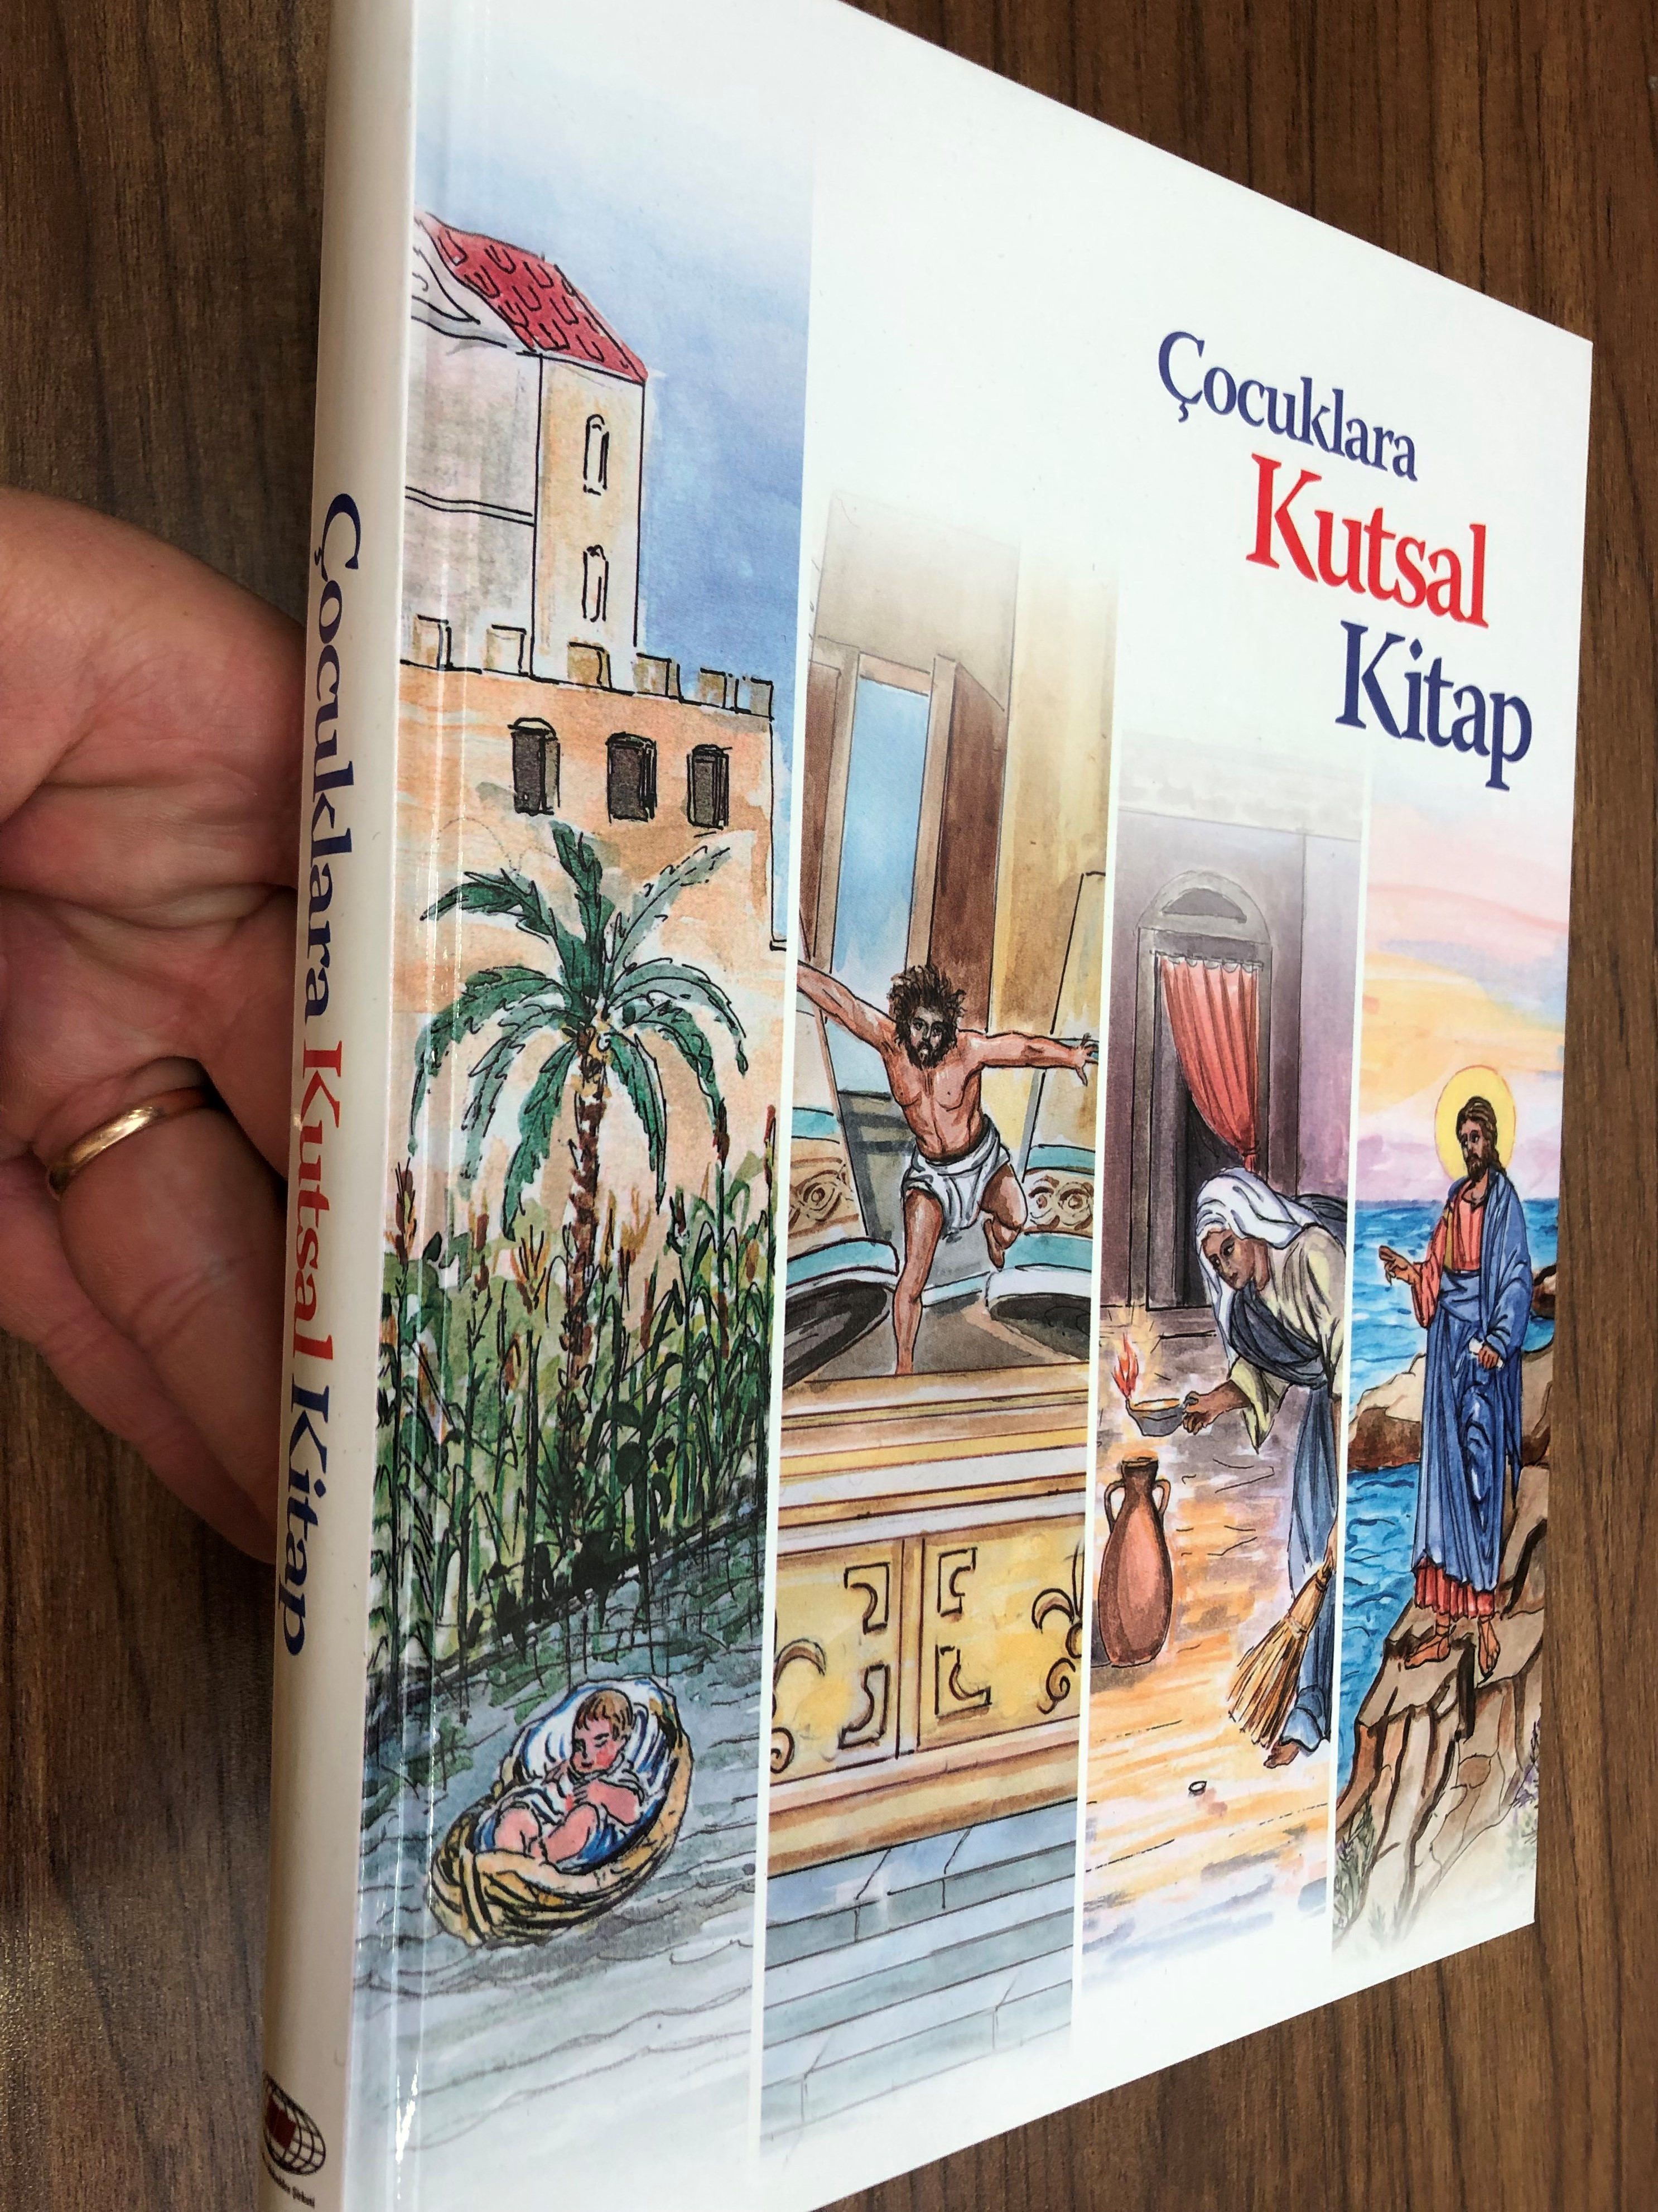 ocuklara-kutsal-kitap-children-s-bible-reader-in-turkish-language-163-stories-from-the-bible-illustrated-in-color-hardcover-2010-2-.jpg